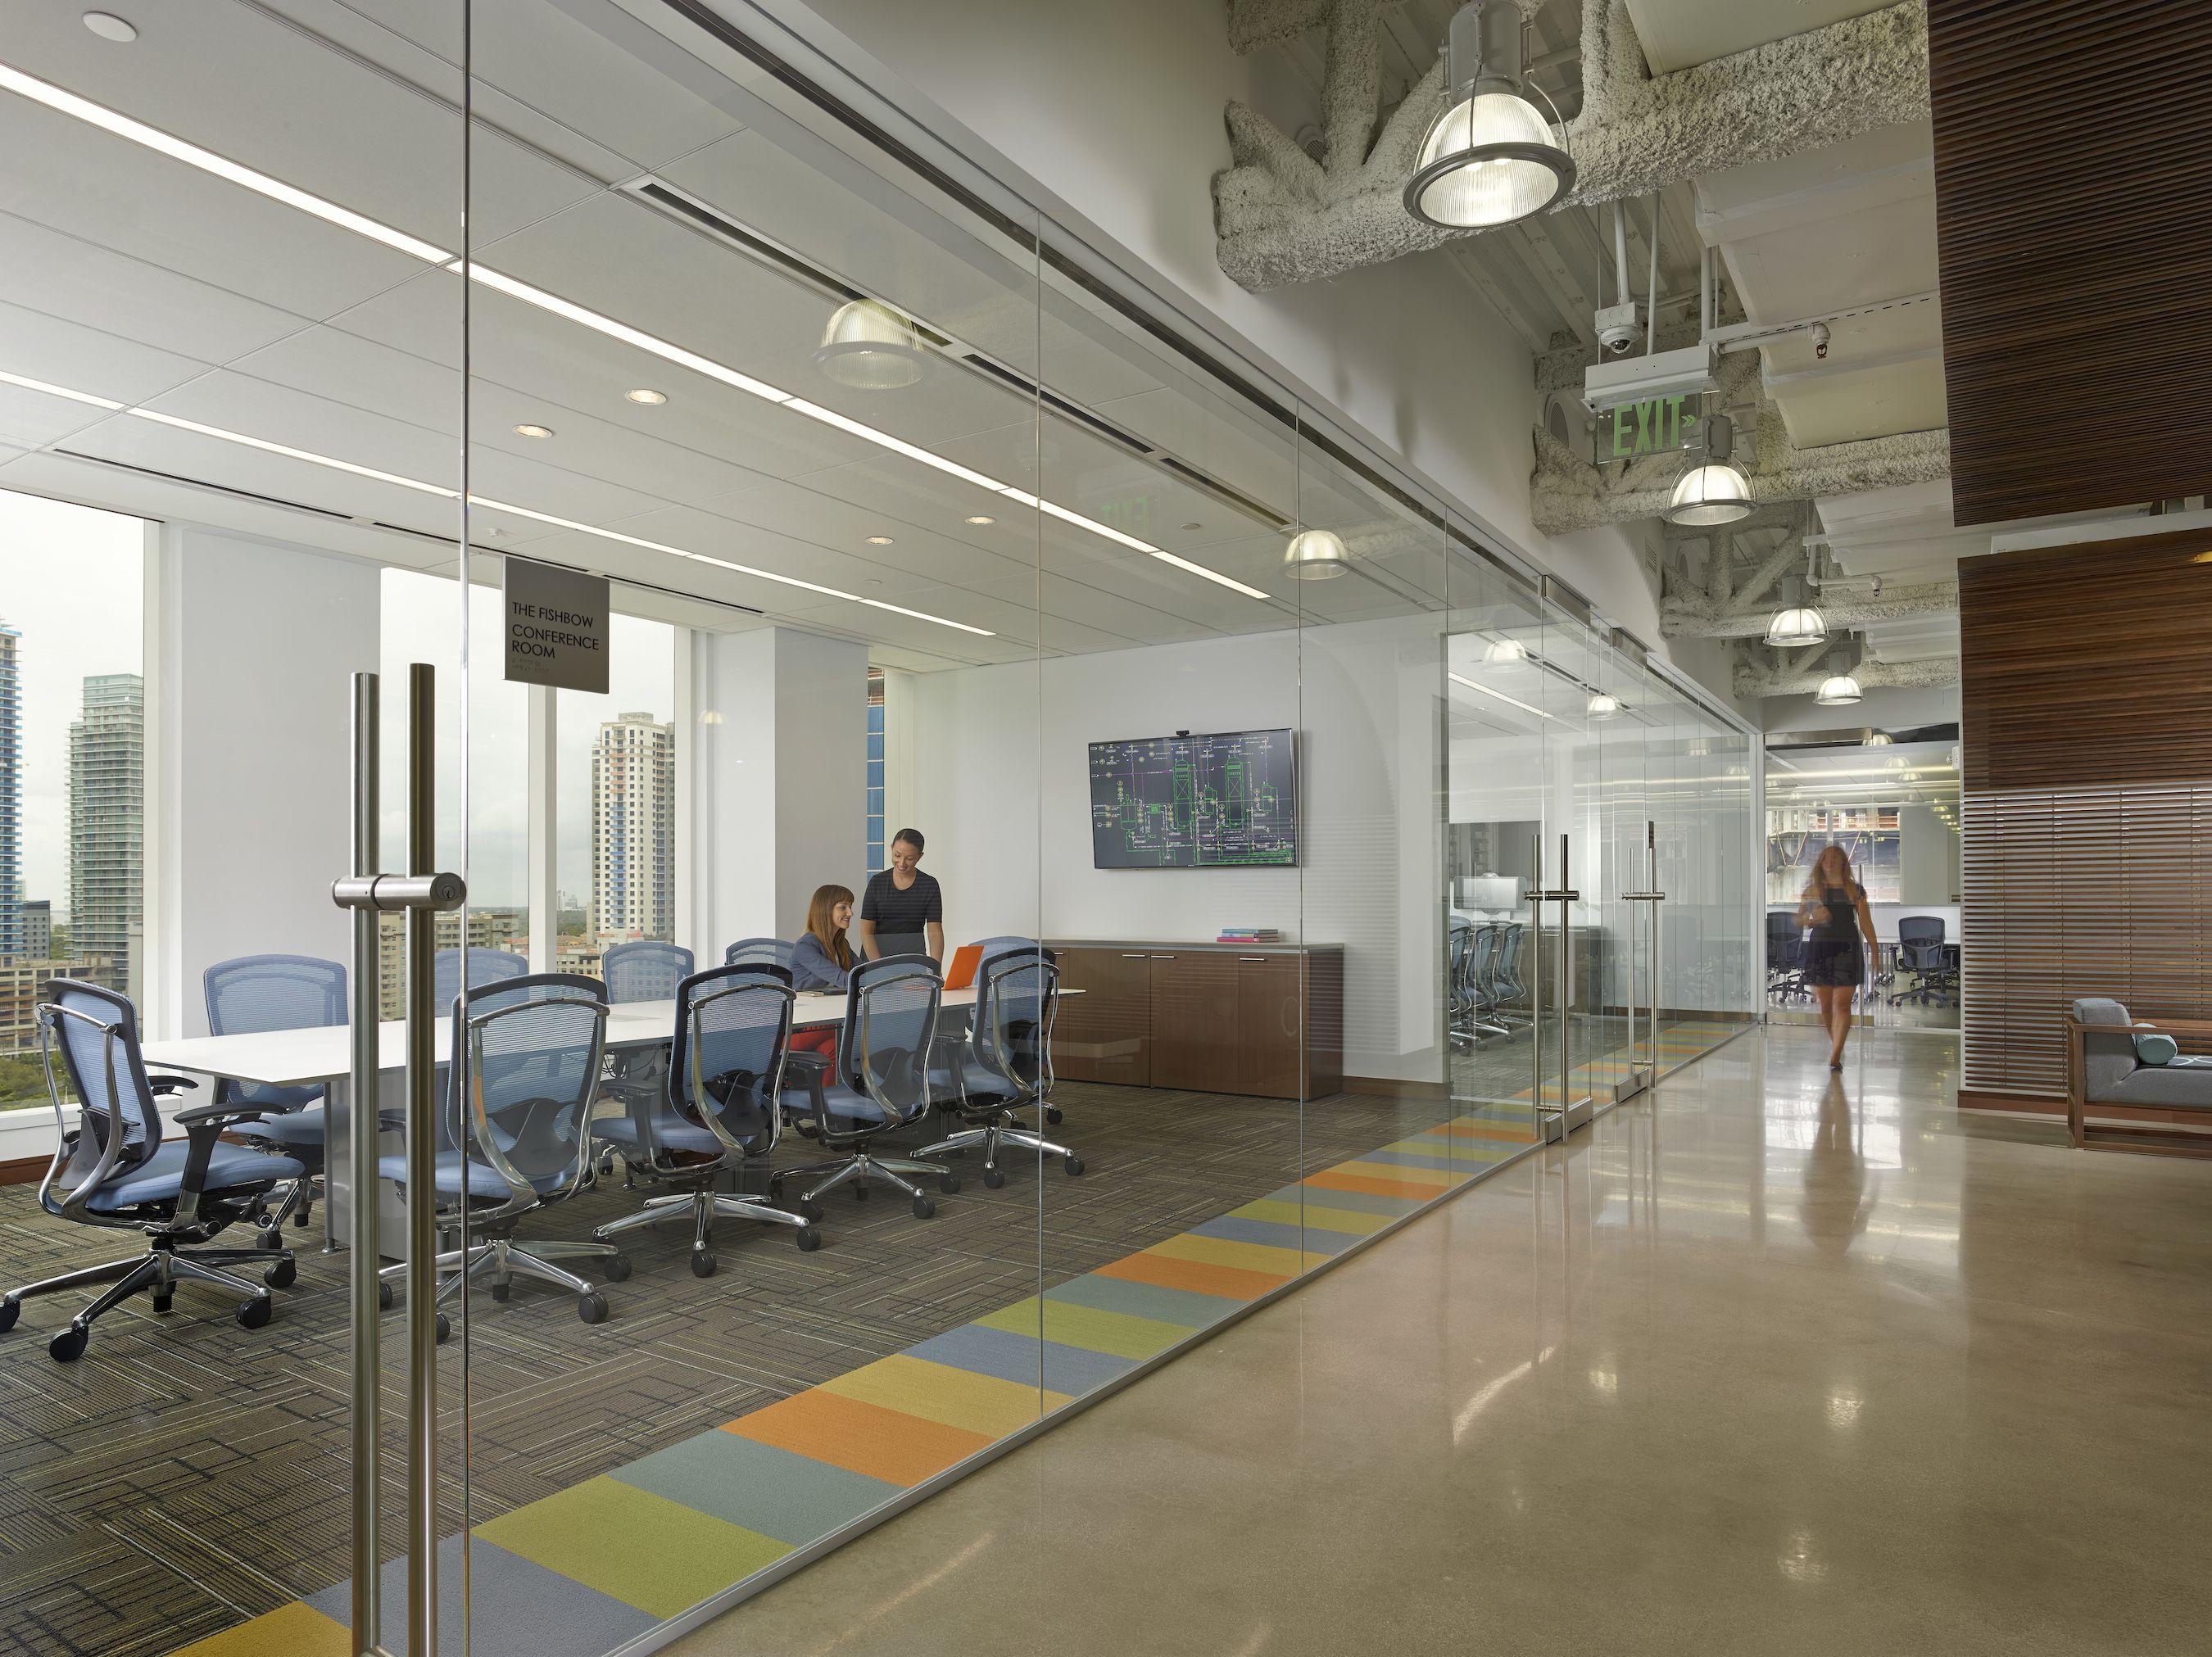 en office ceilings led lights ie rick dali lamp ceiling k square